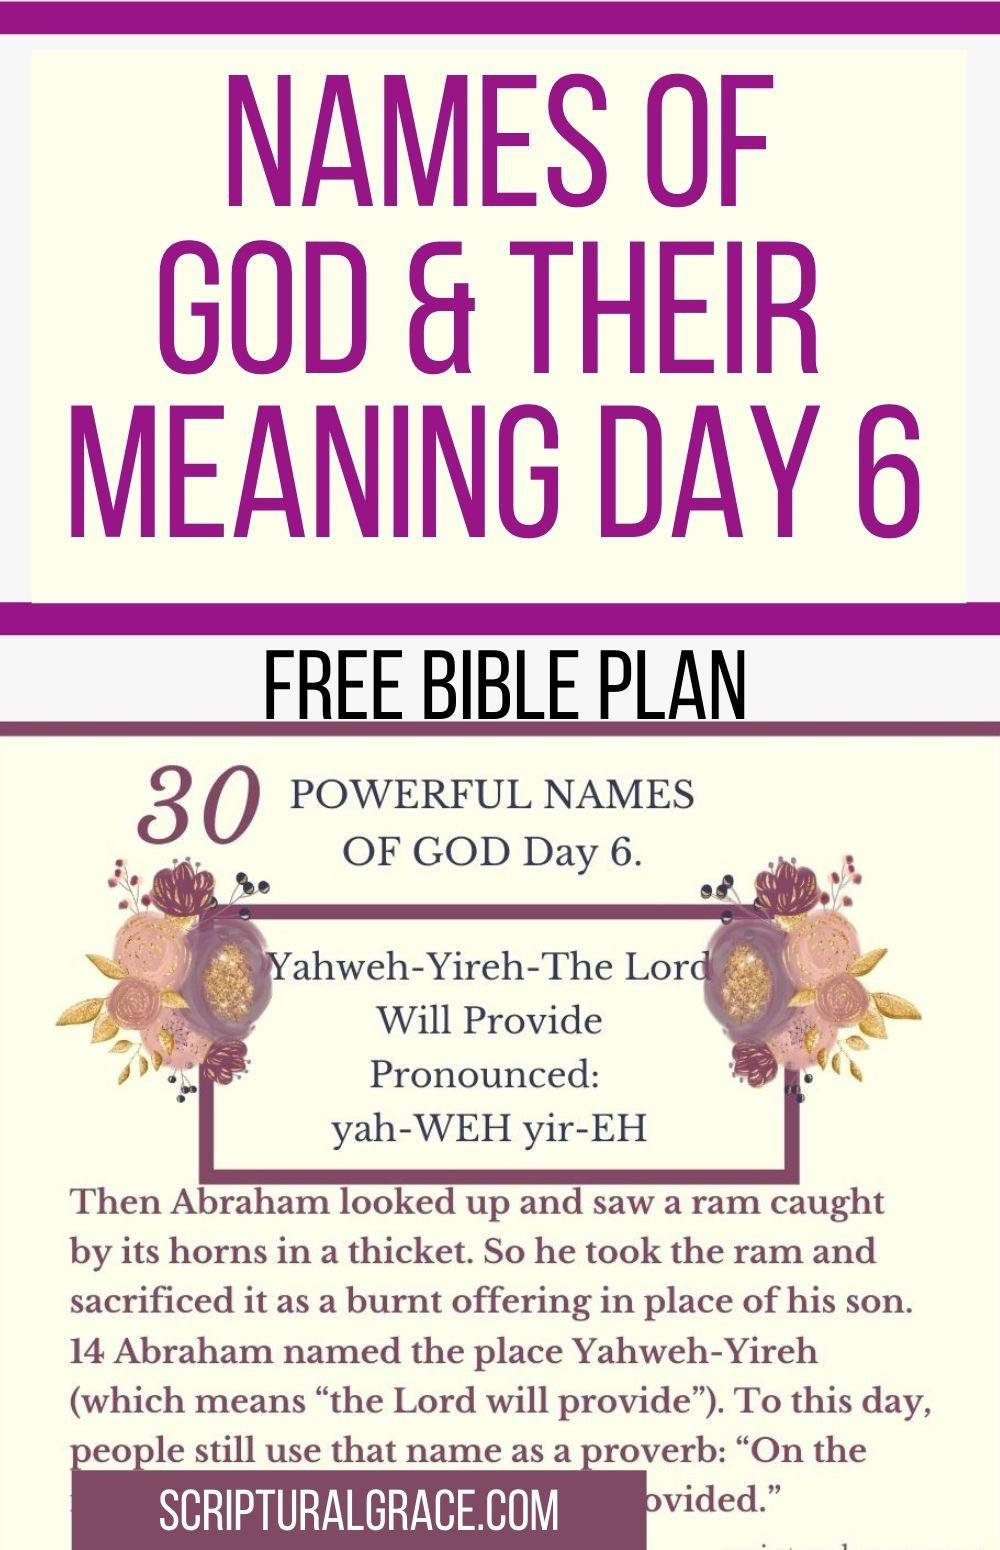 Yahweh-Yireh biblical meaning free chart names of God